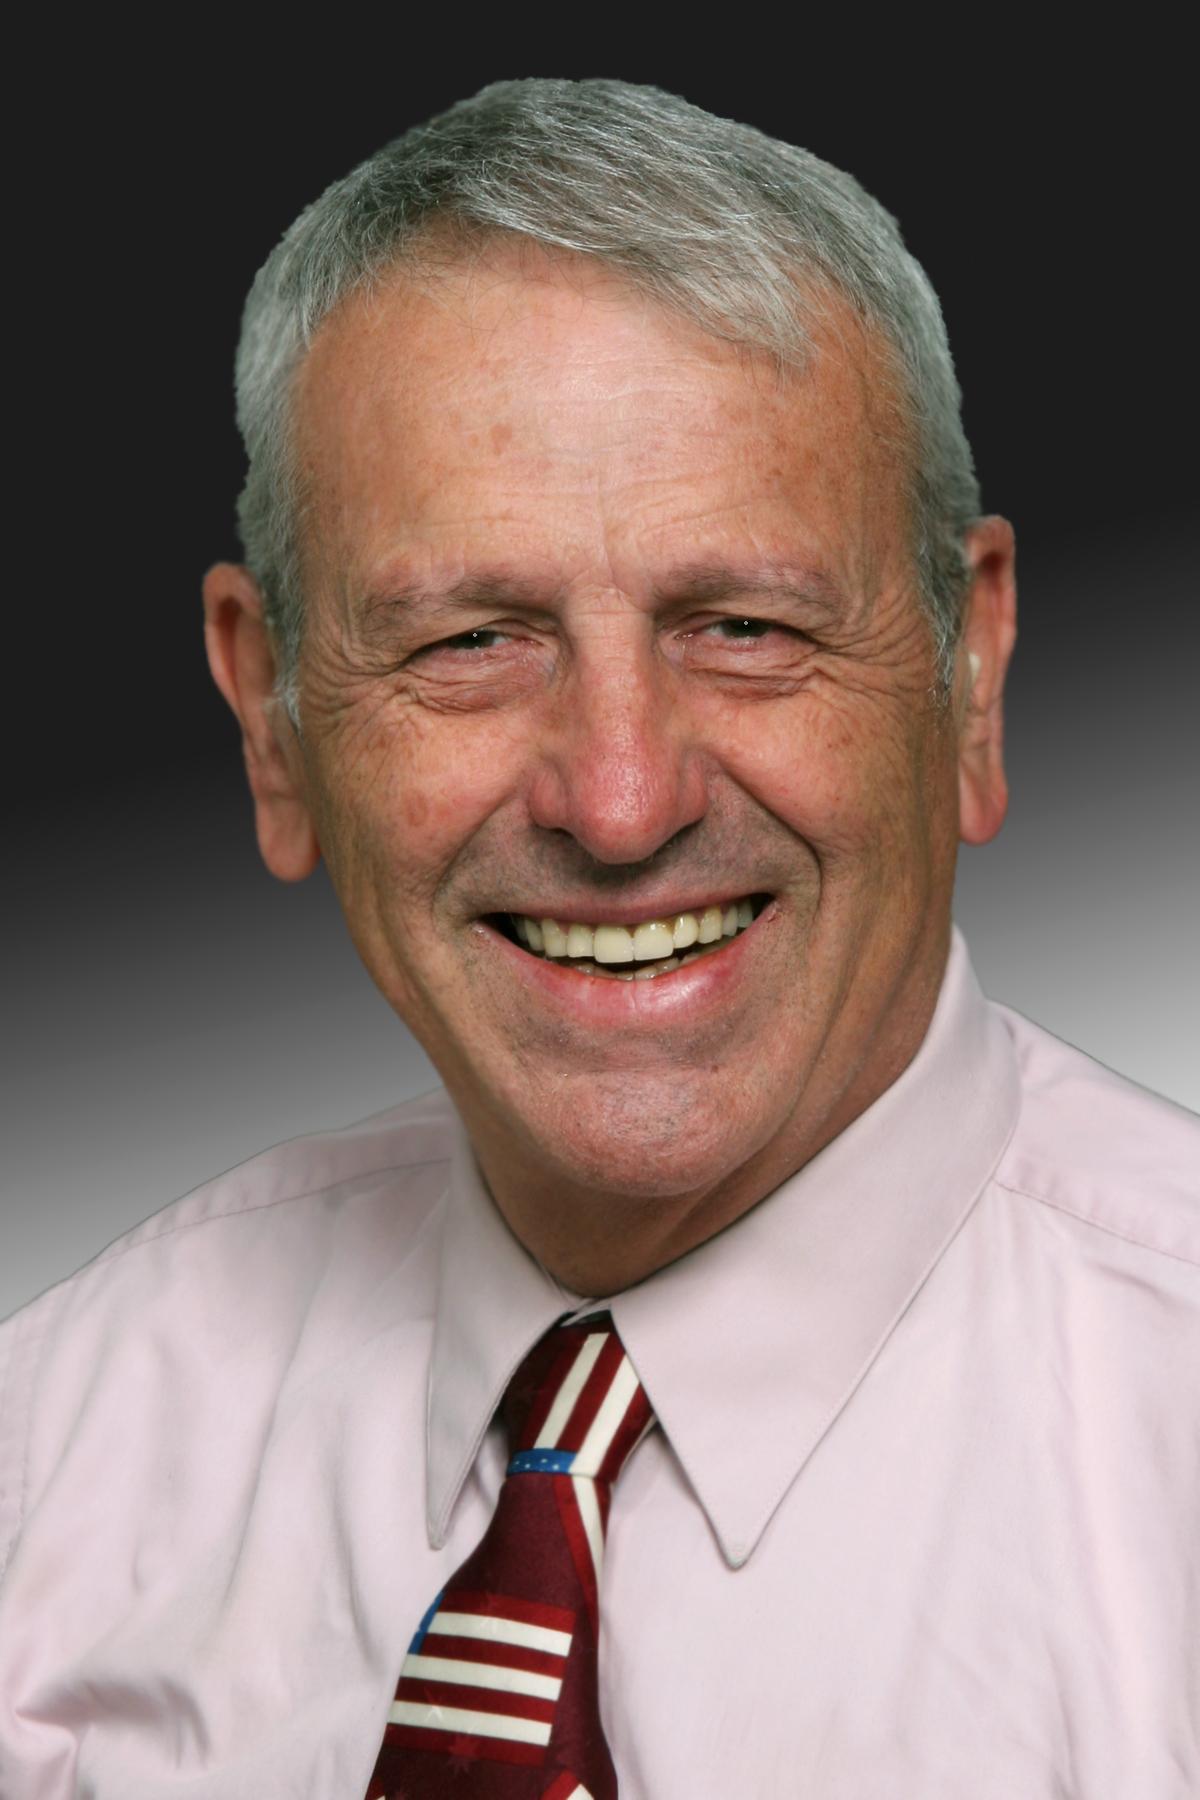 Steve Sterry